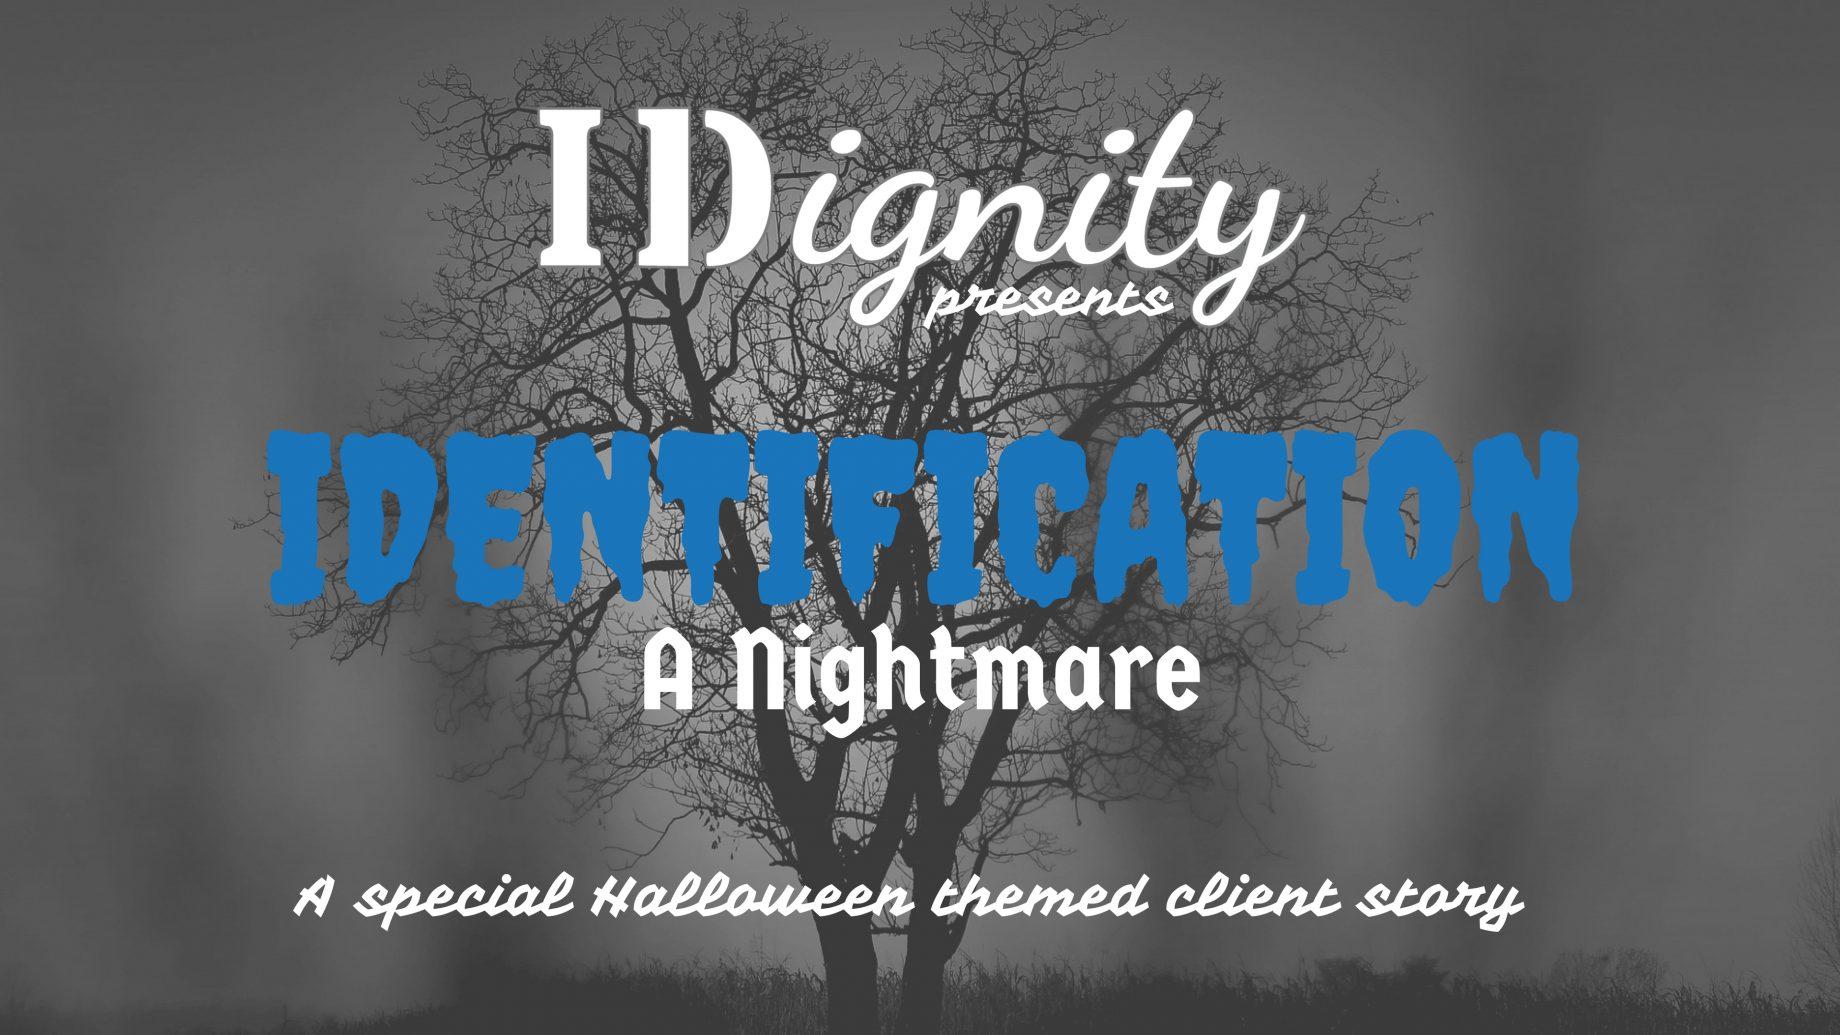 Identification: A Nightmare